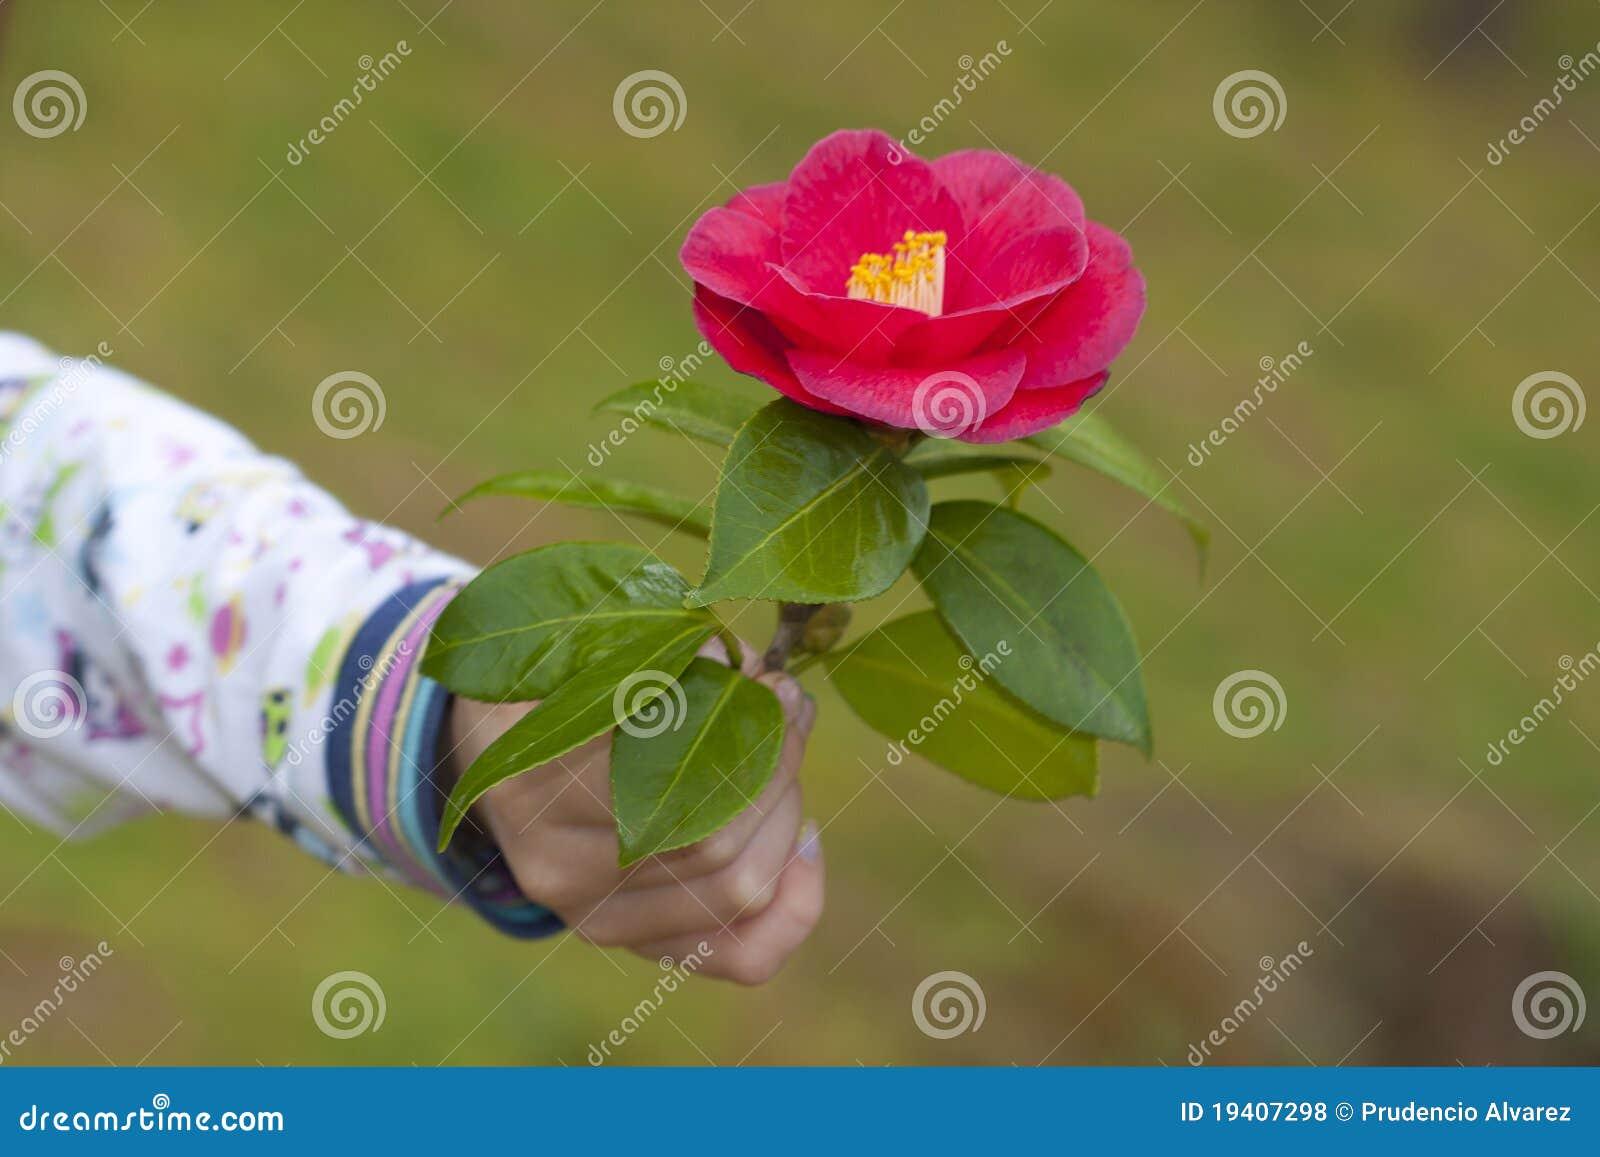 Symbole de l 39 amiti et de l 39 amour photos libres de droits image 19407298 - Symbole de l orchidee ...